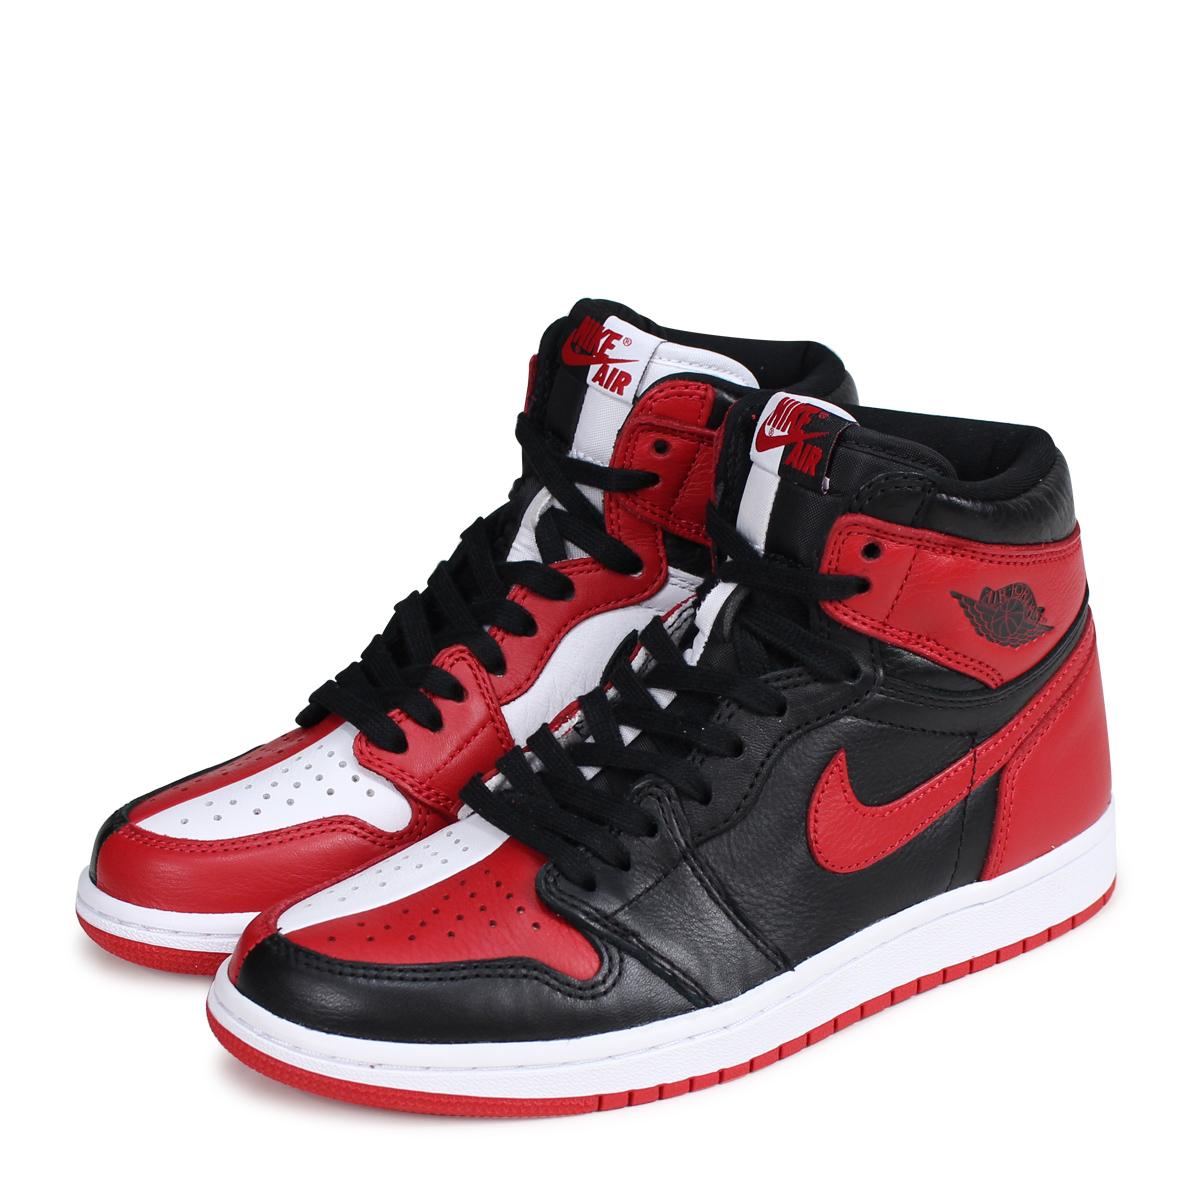 designer fashion 0ed35 5504a NIKE AIR JORDAN 1 RETRO HIGH OG HOMAGE TO HOME Nike Air Jordan 1 nostalgic  Haile Dis sneakers 861,428-061 red  load planned Shinnyu load in  reservation ...